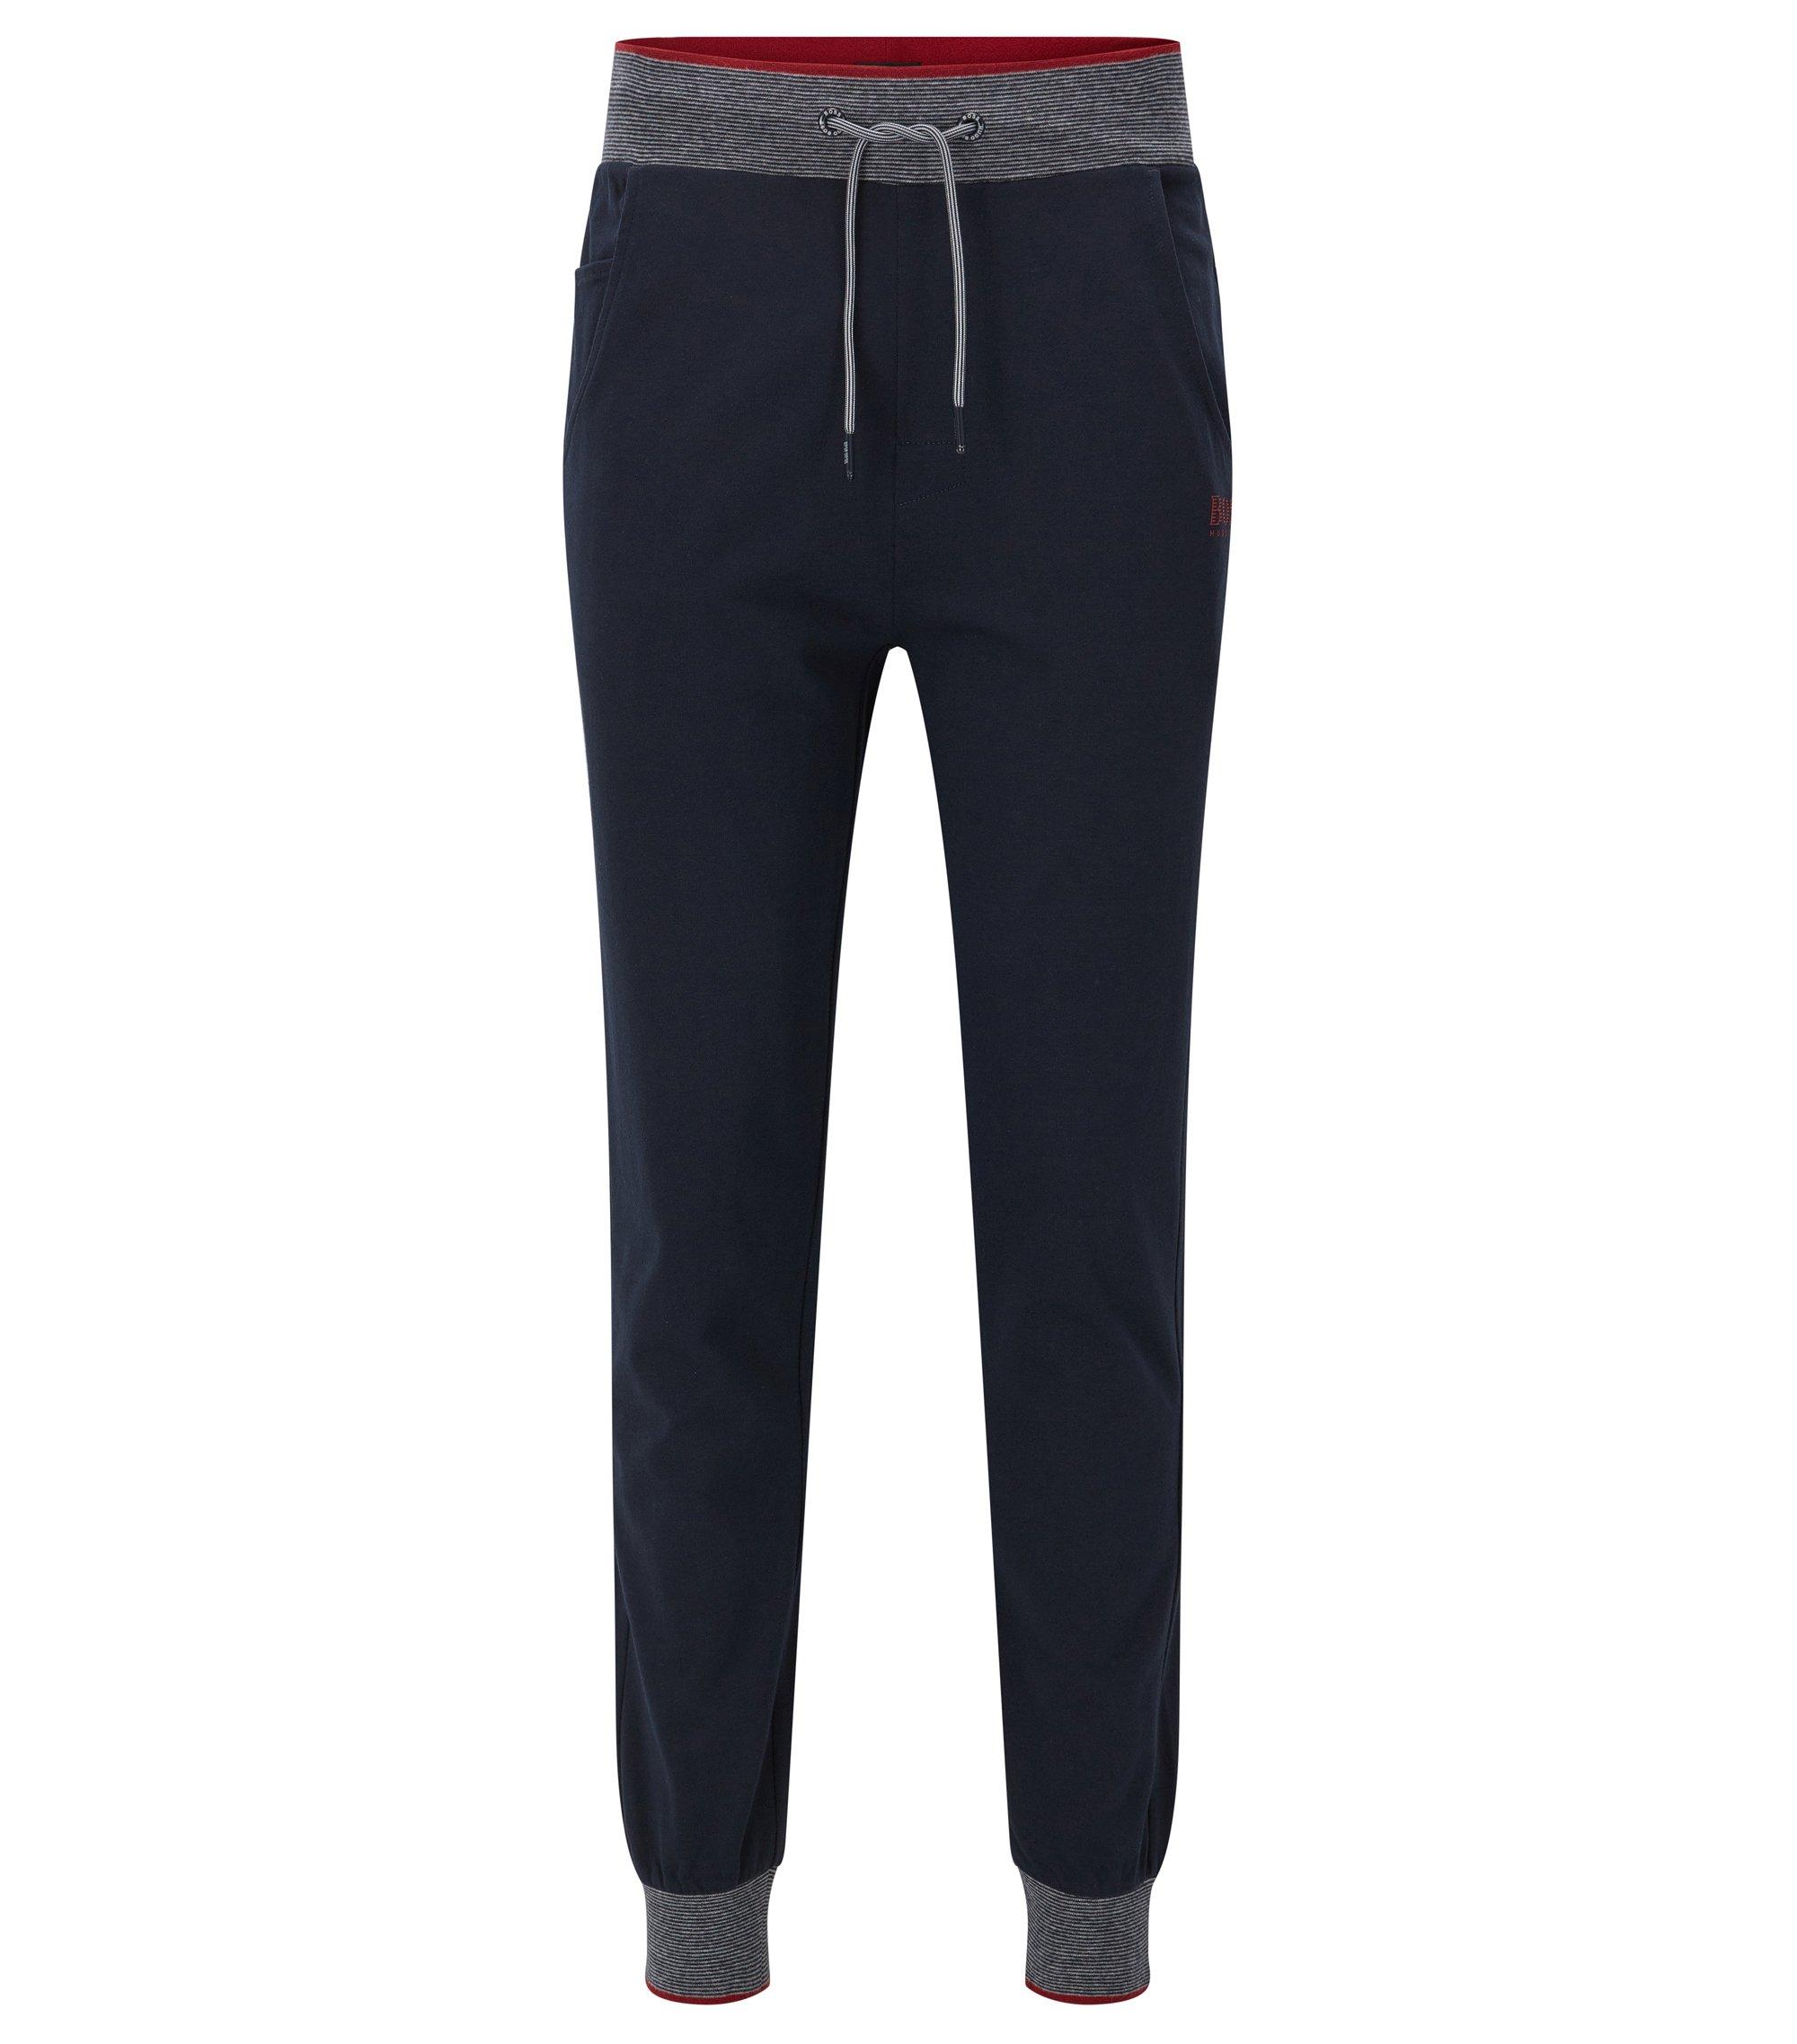 Pantalones de chándal con puños en punto de algodón, Azul oscuro